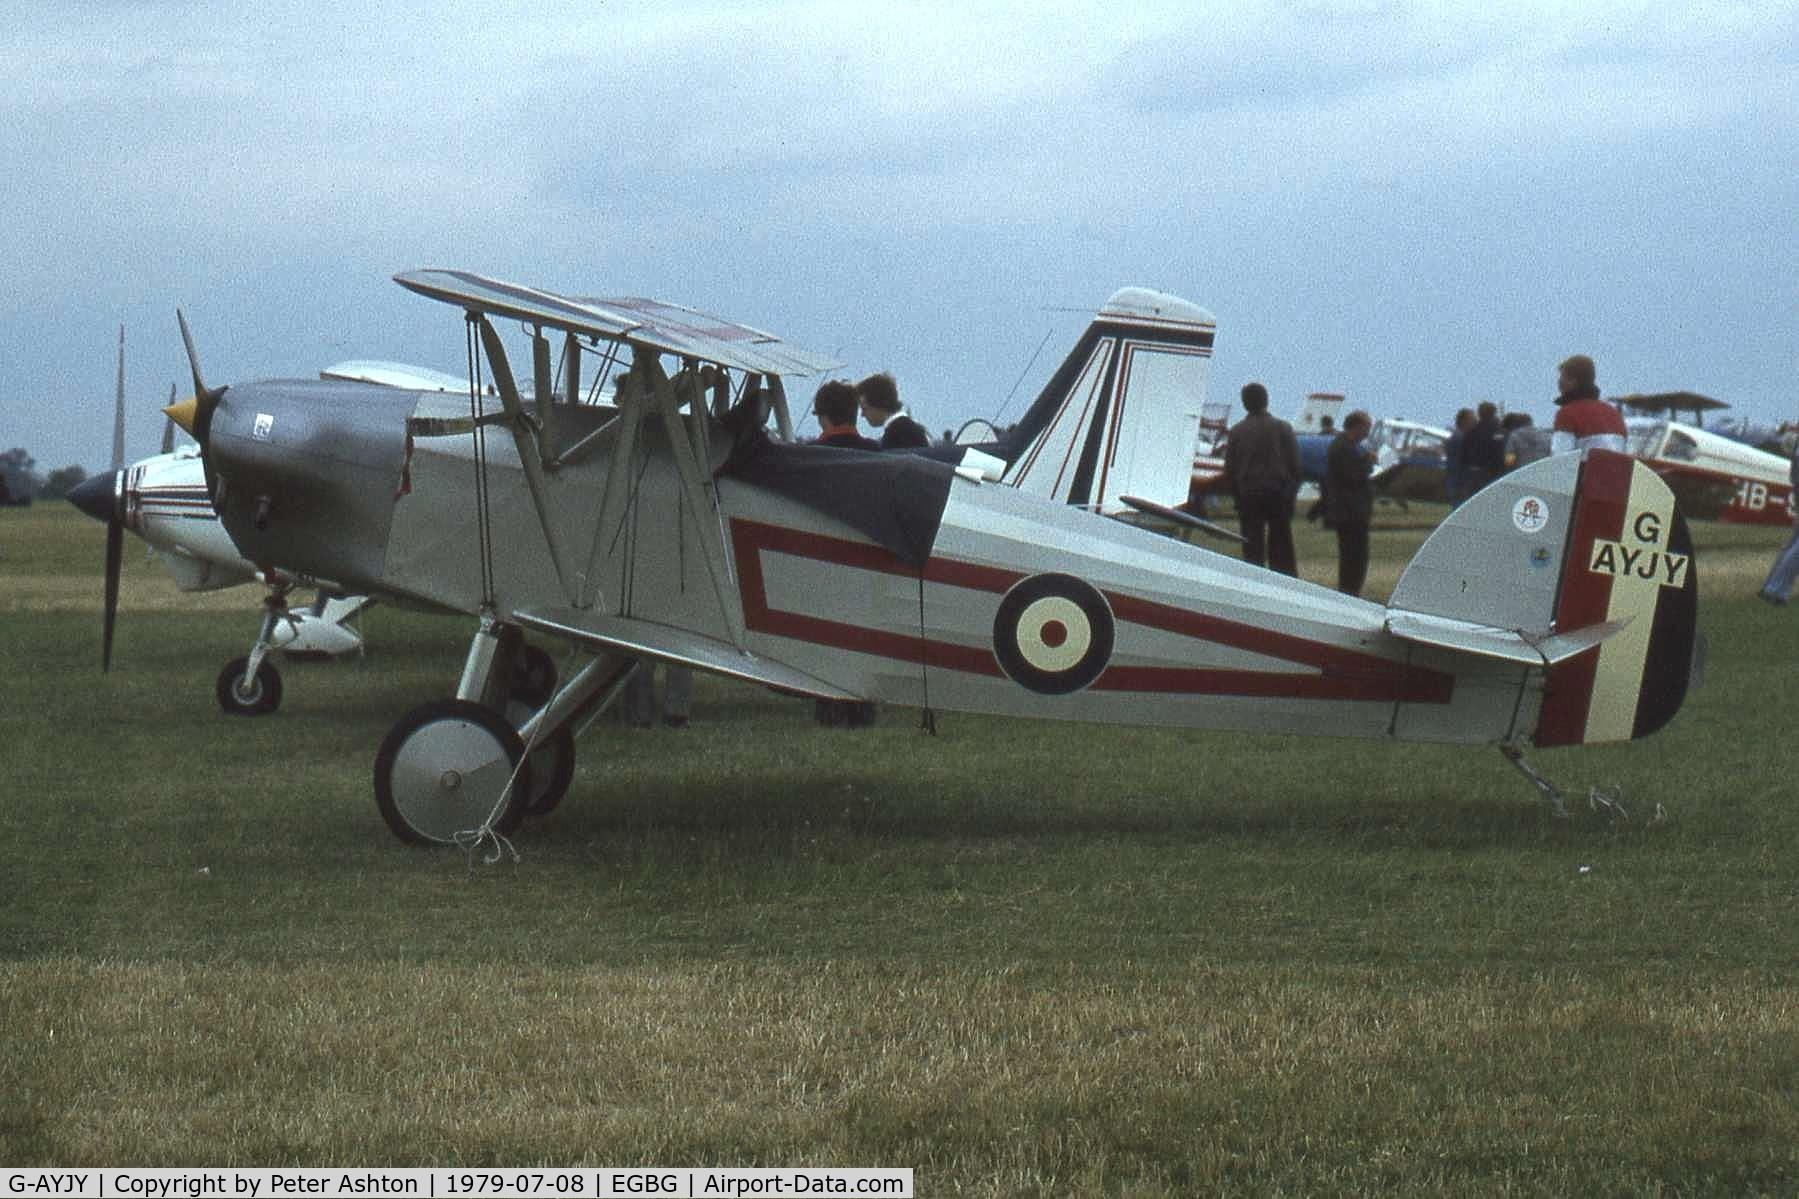 G-AYJY, 1975 Isaacs Fury II C/N PFA 1373, PFA Rally 1979